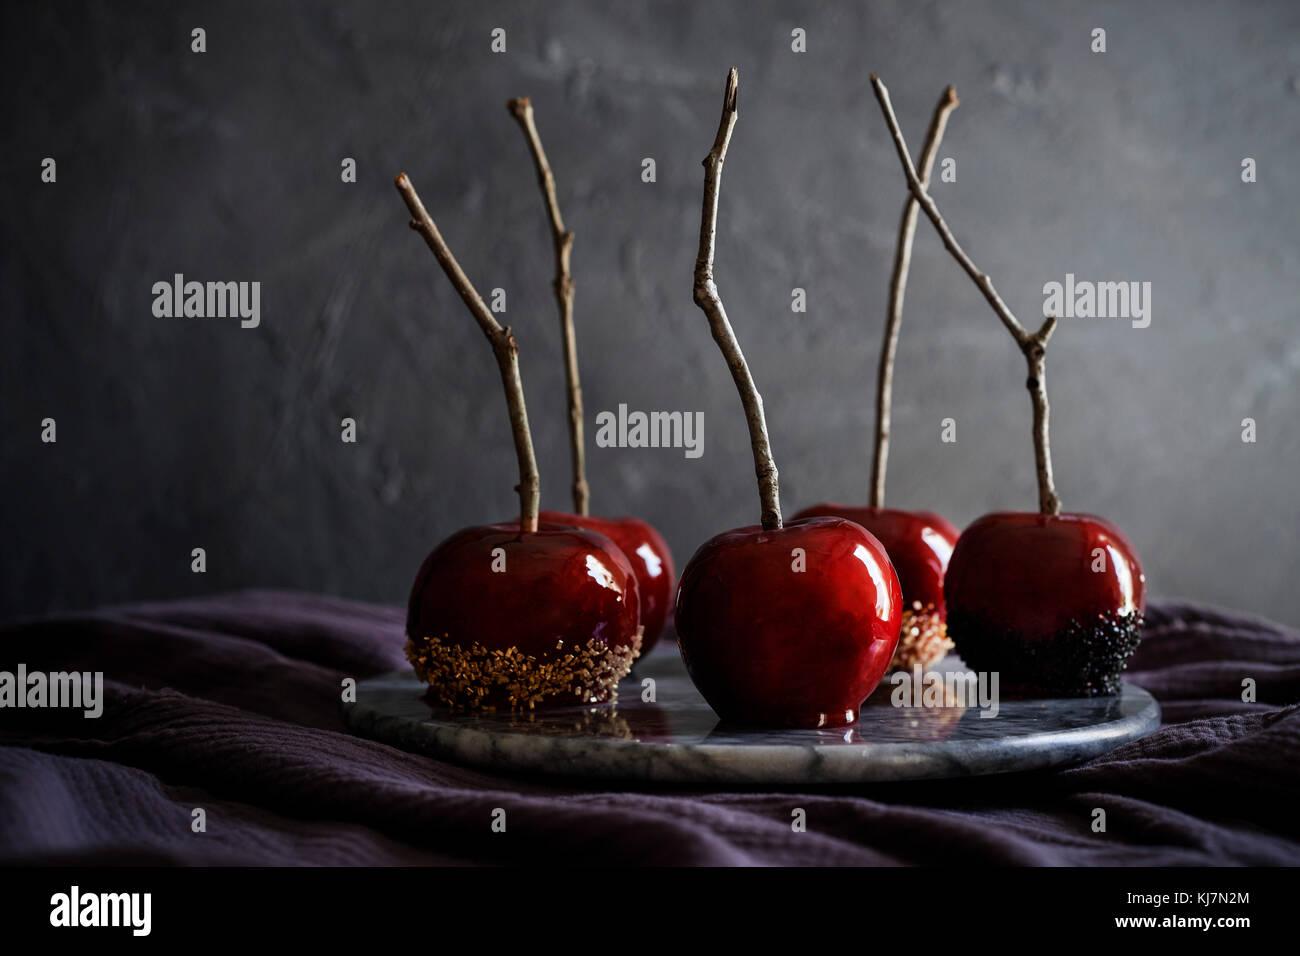 Bandeja de mármol precioso, rojo, manzanas de caramelo en lino de color púrpura oscuro. Moody sentir con oscuro fondo de textura. Foto de stock